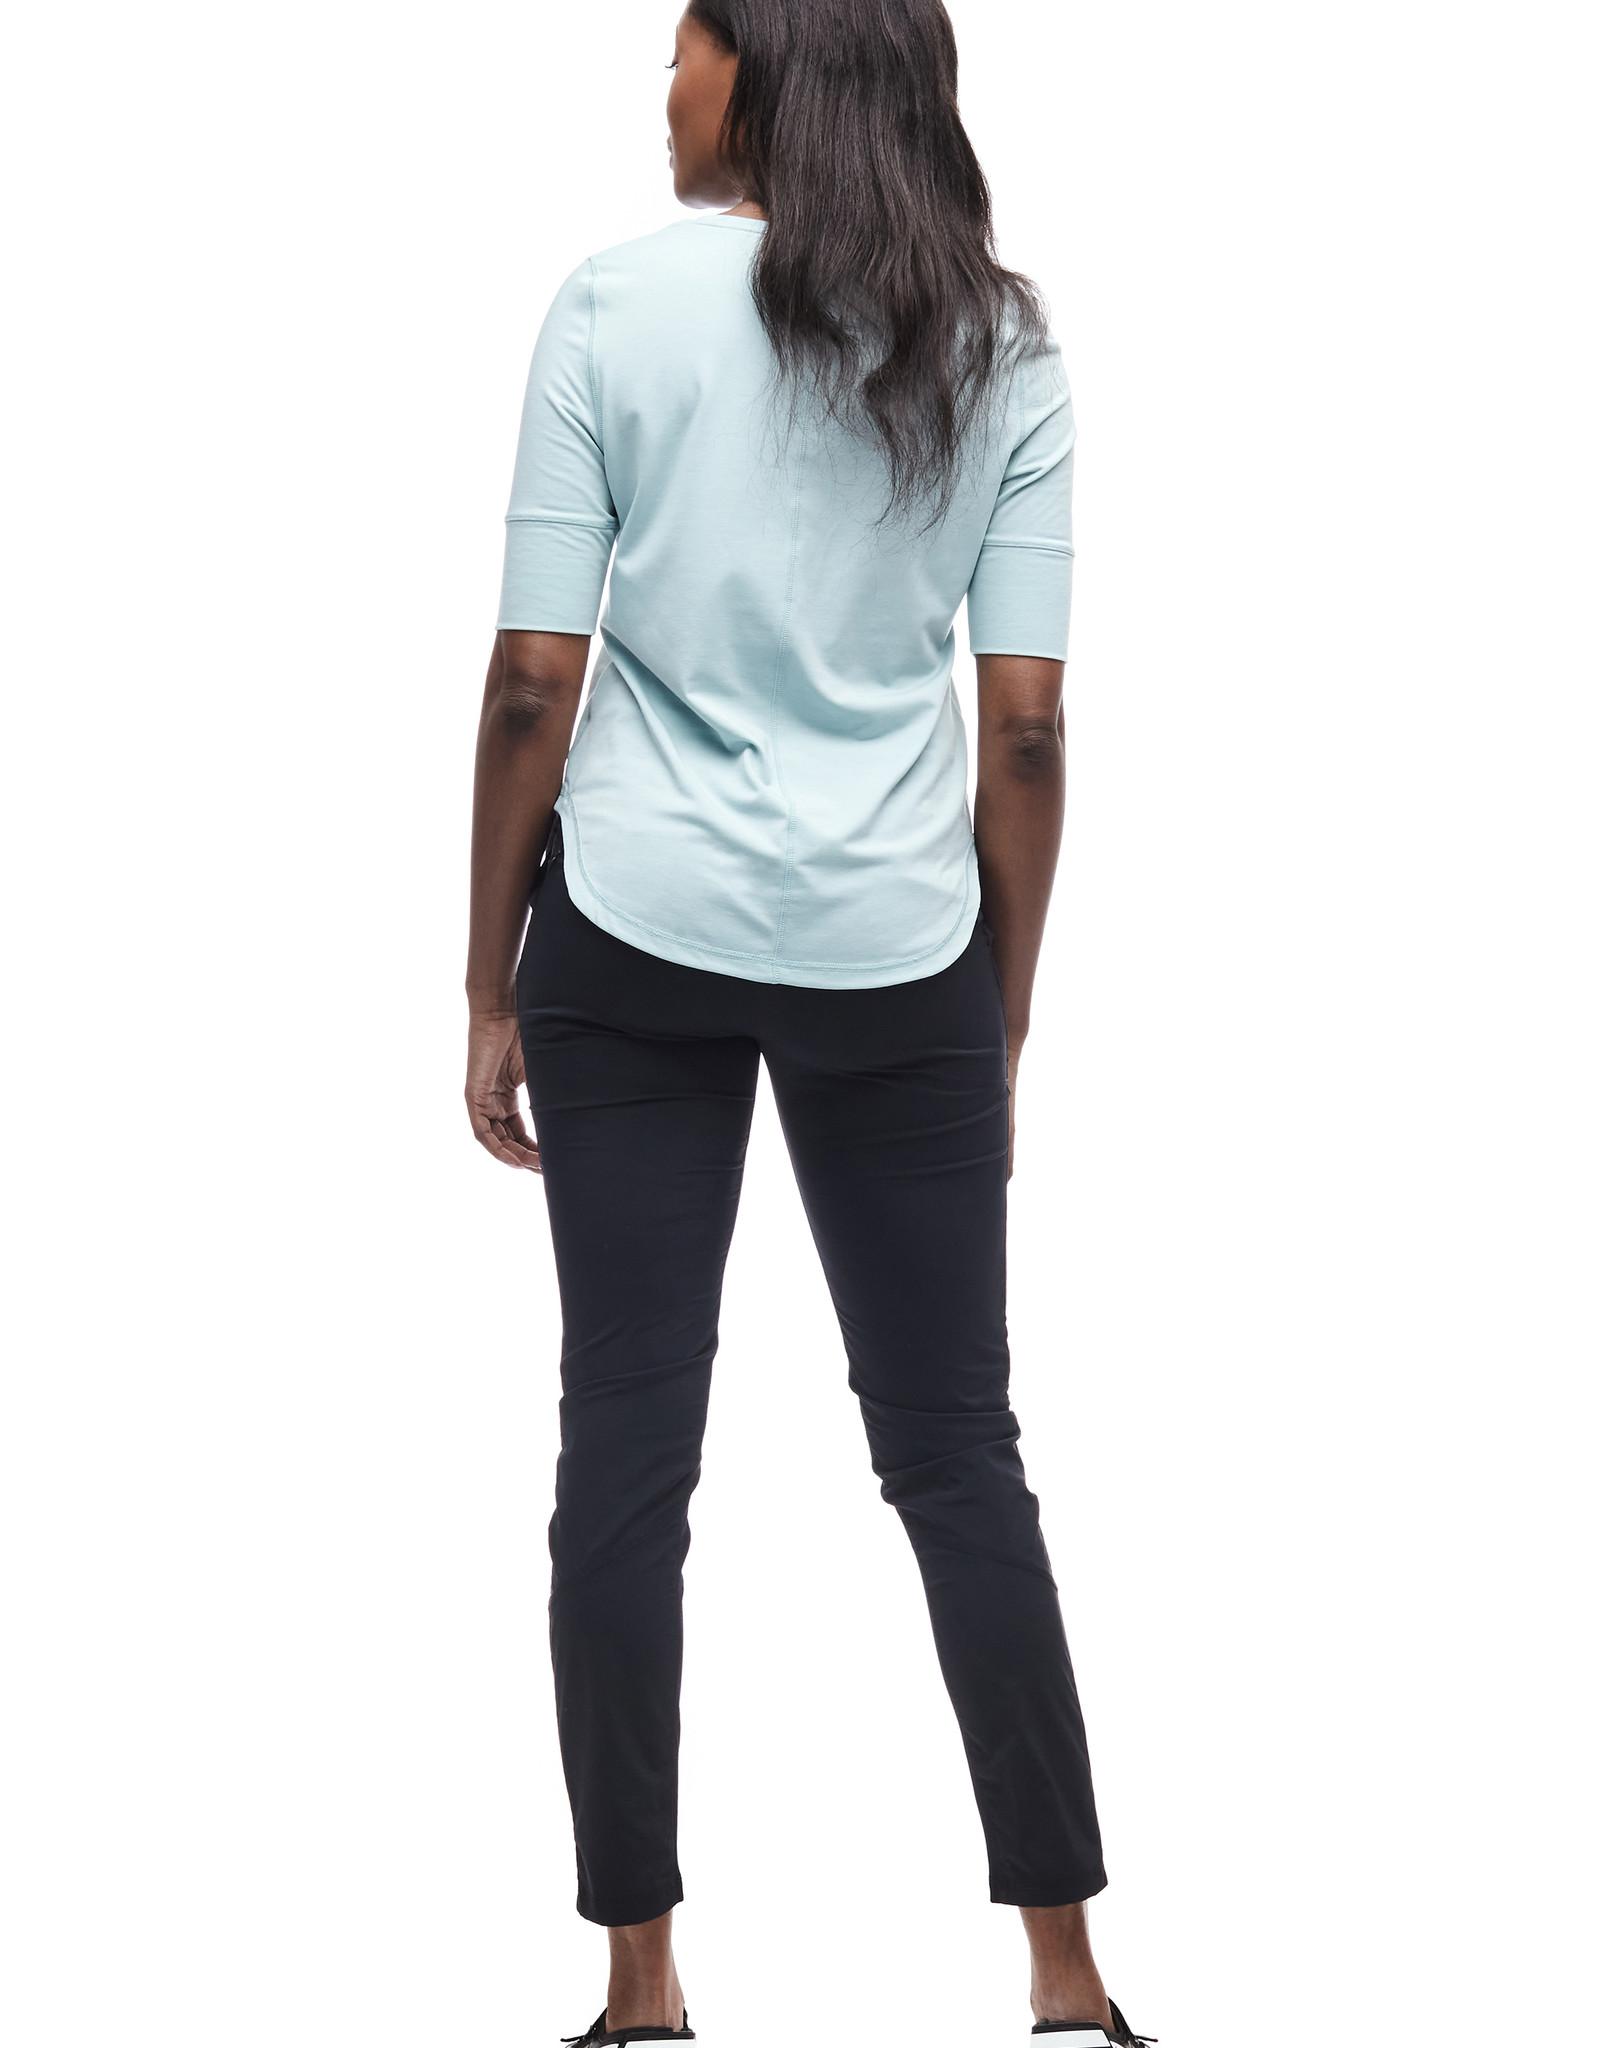 Indygena is now Indyeva VOOLAMA III shirt